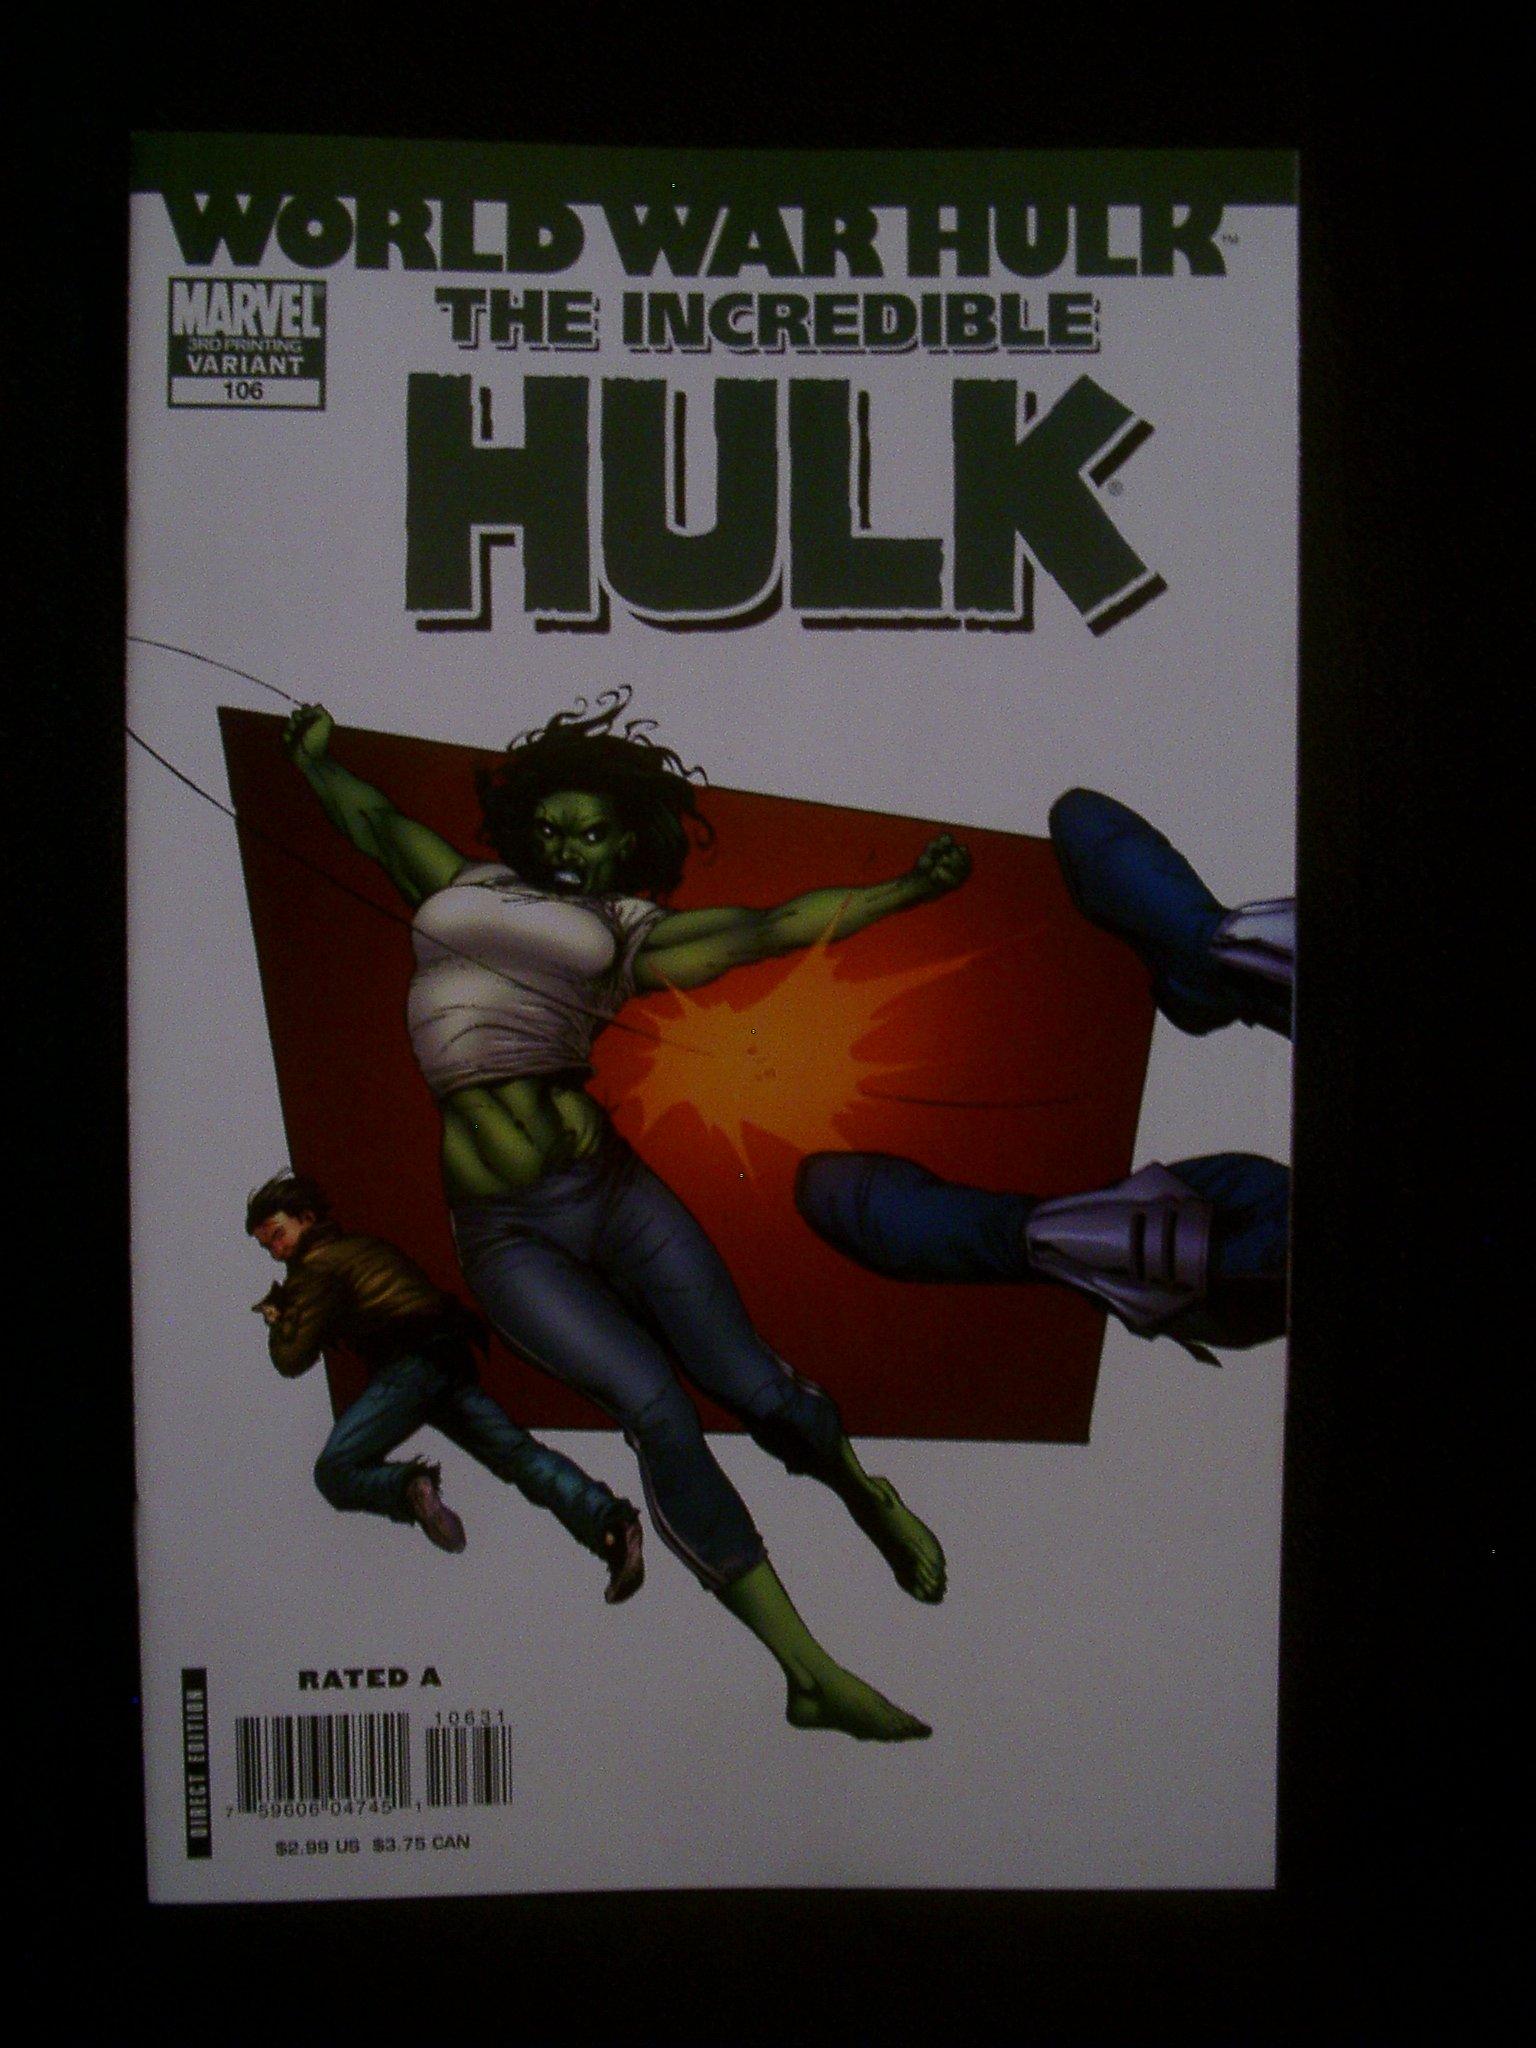 Incredible Hulk #106 3rd Print Variant Cover PDF